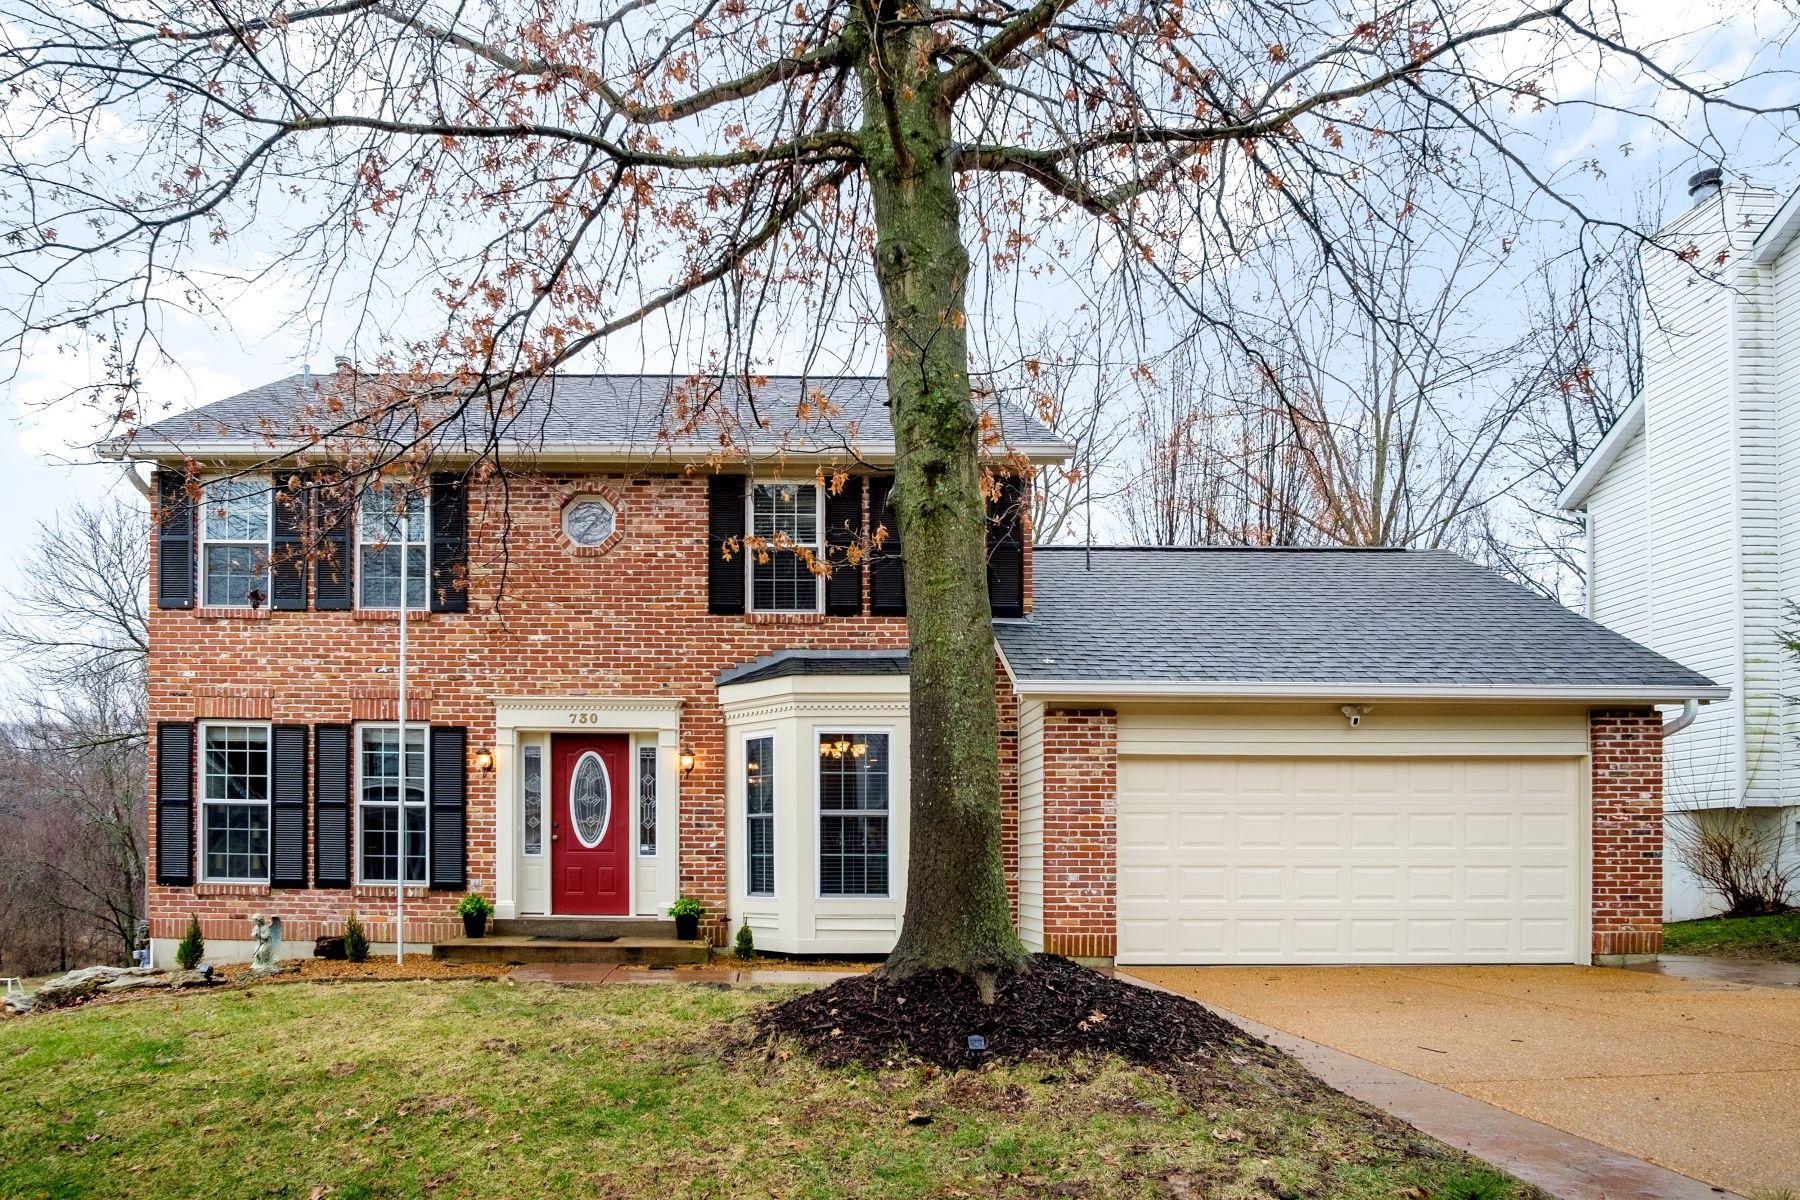 Single Family Homes für Verkauf beim Westbrooke Two-Story with Impressive Backyard 730 Spring Hill Farm Drive, Ballwin, Missouri 63021 Vereinigte Staaten